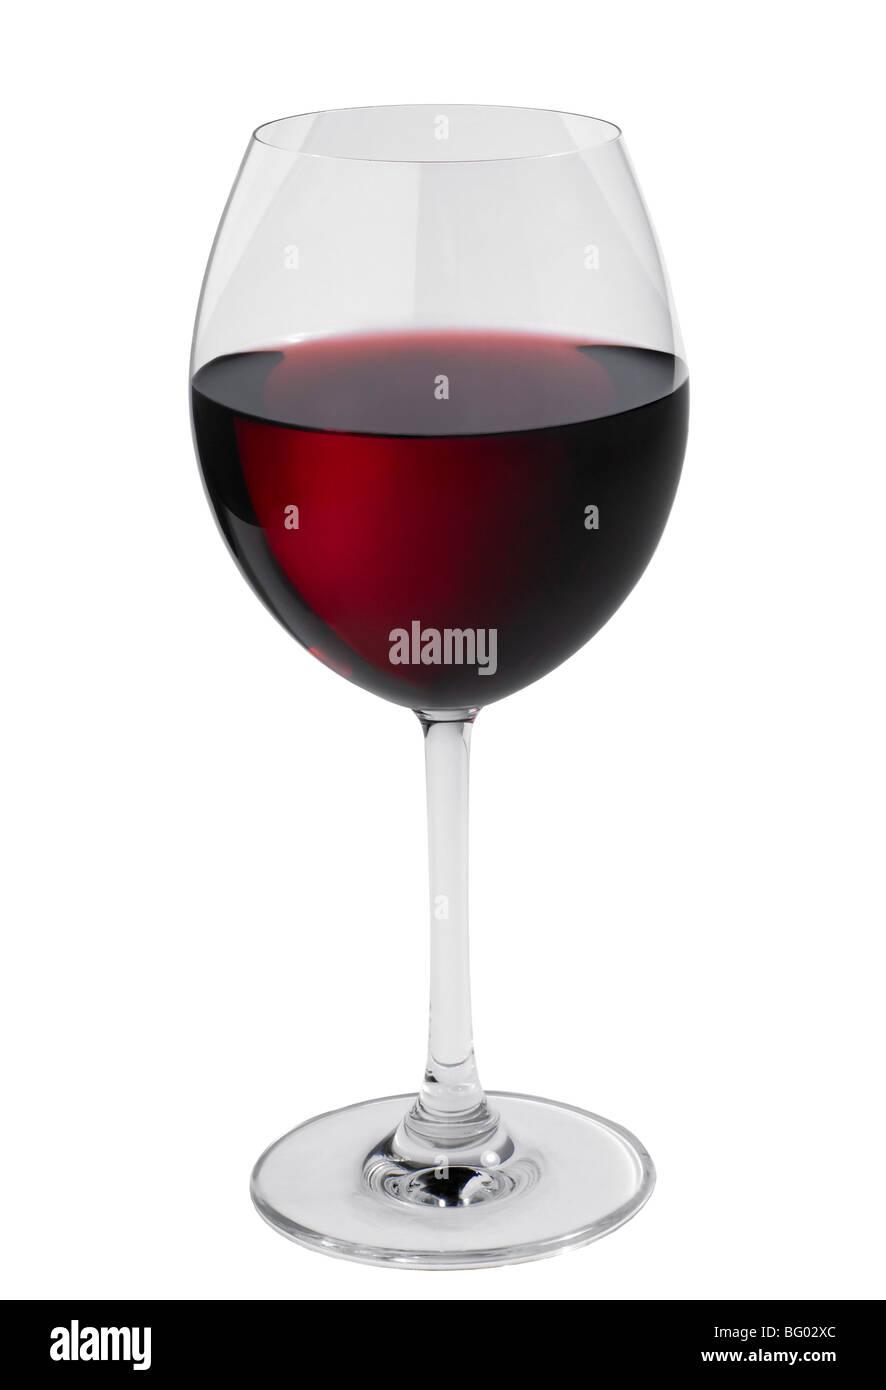 Esbozó un vaso de vino tinto Imagen De Stock